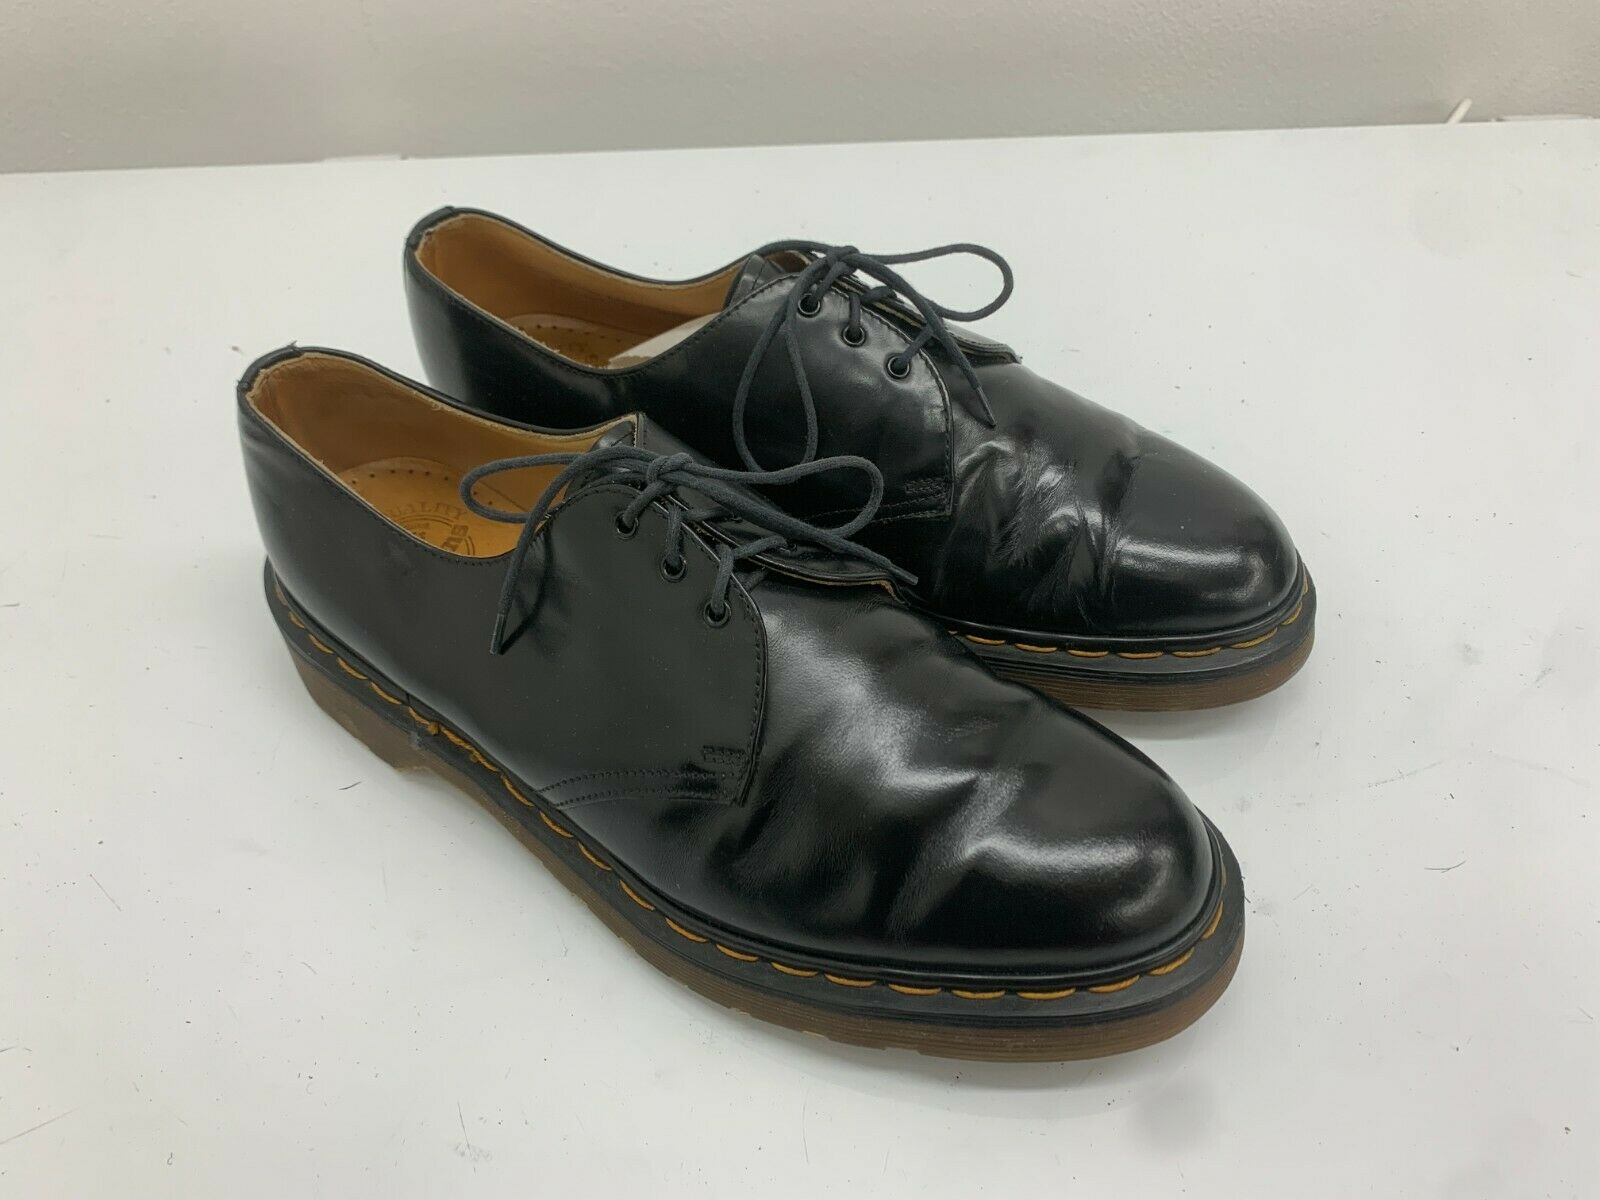 Doc Dr Martens Shoes, 3 Eyelets, Black Shiny, Size 9UK, Rare. Made In England